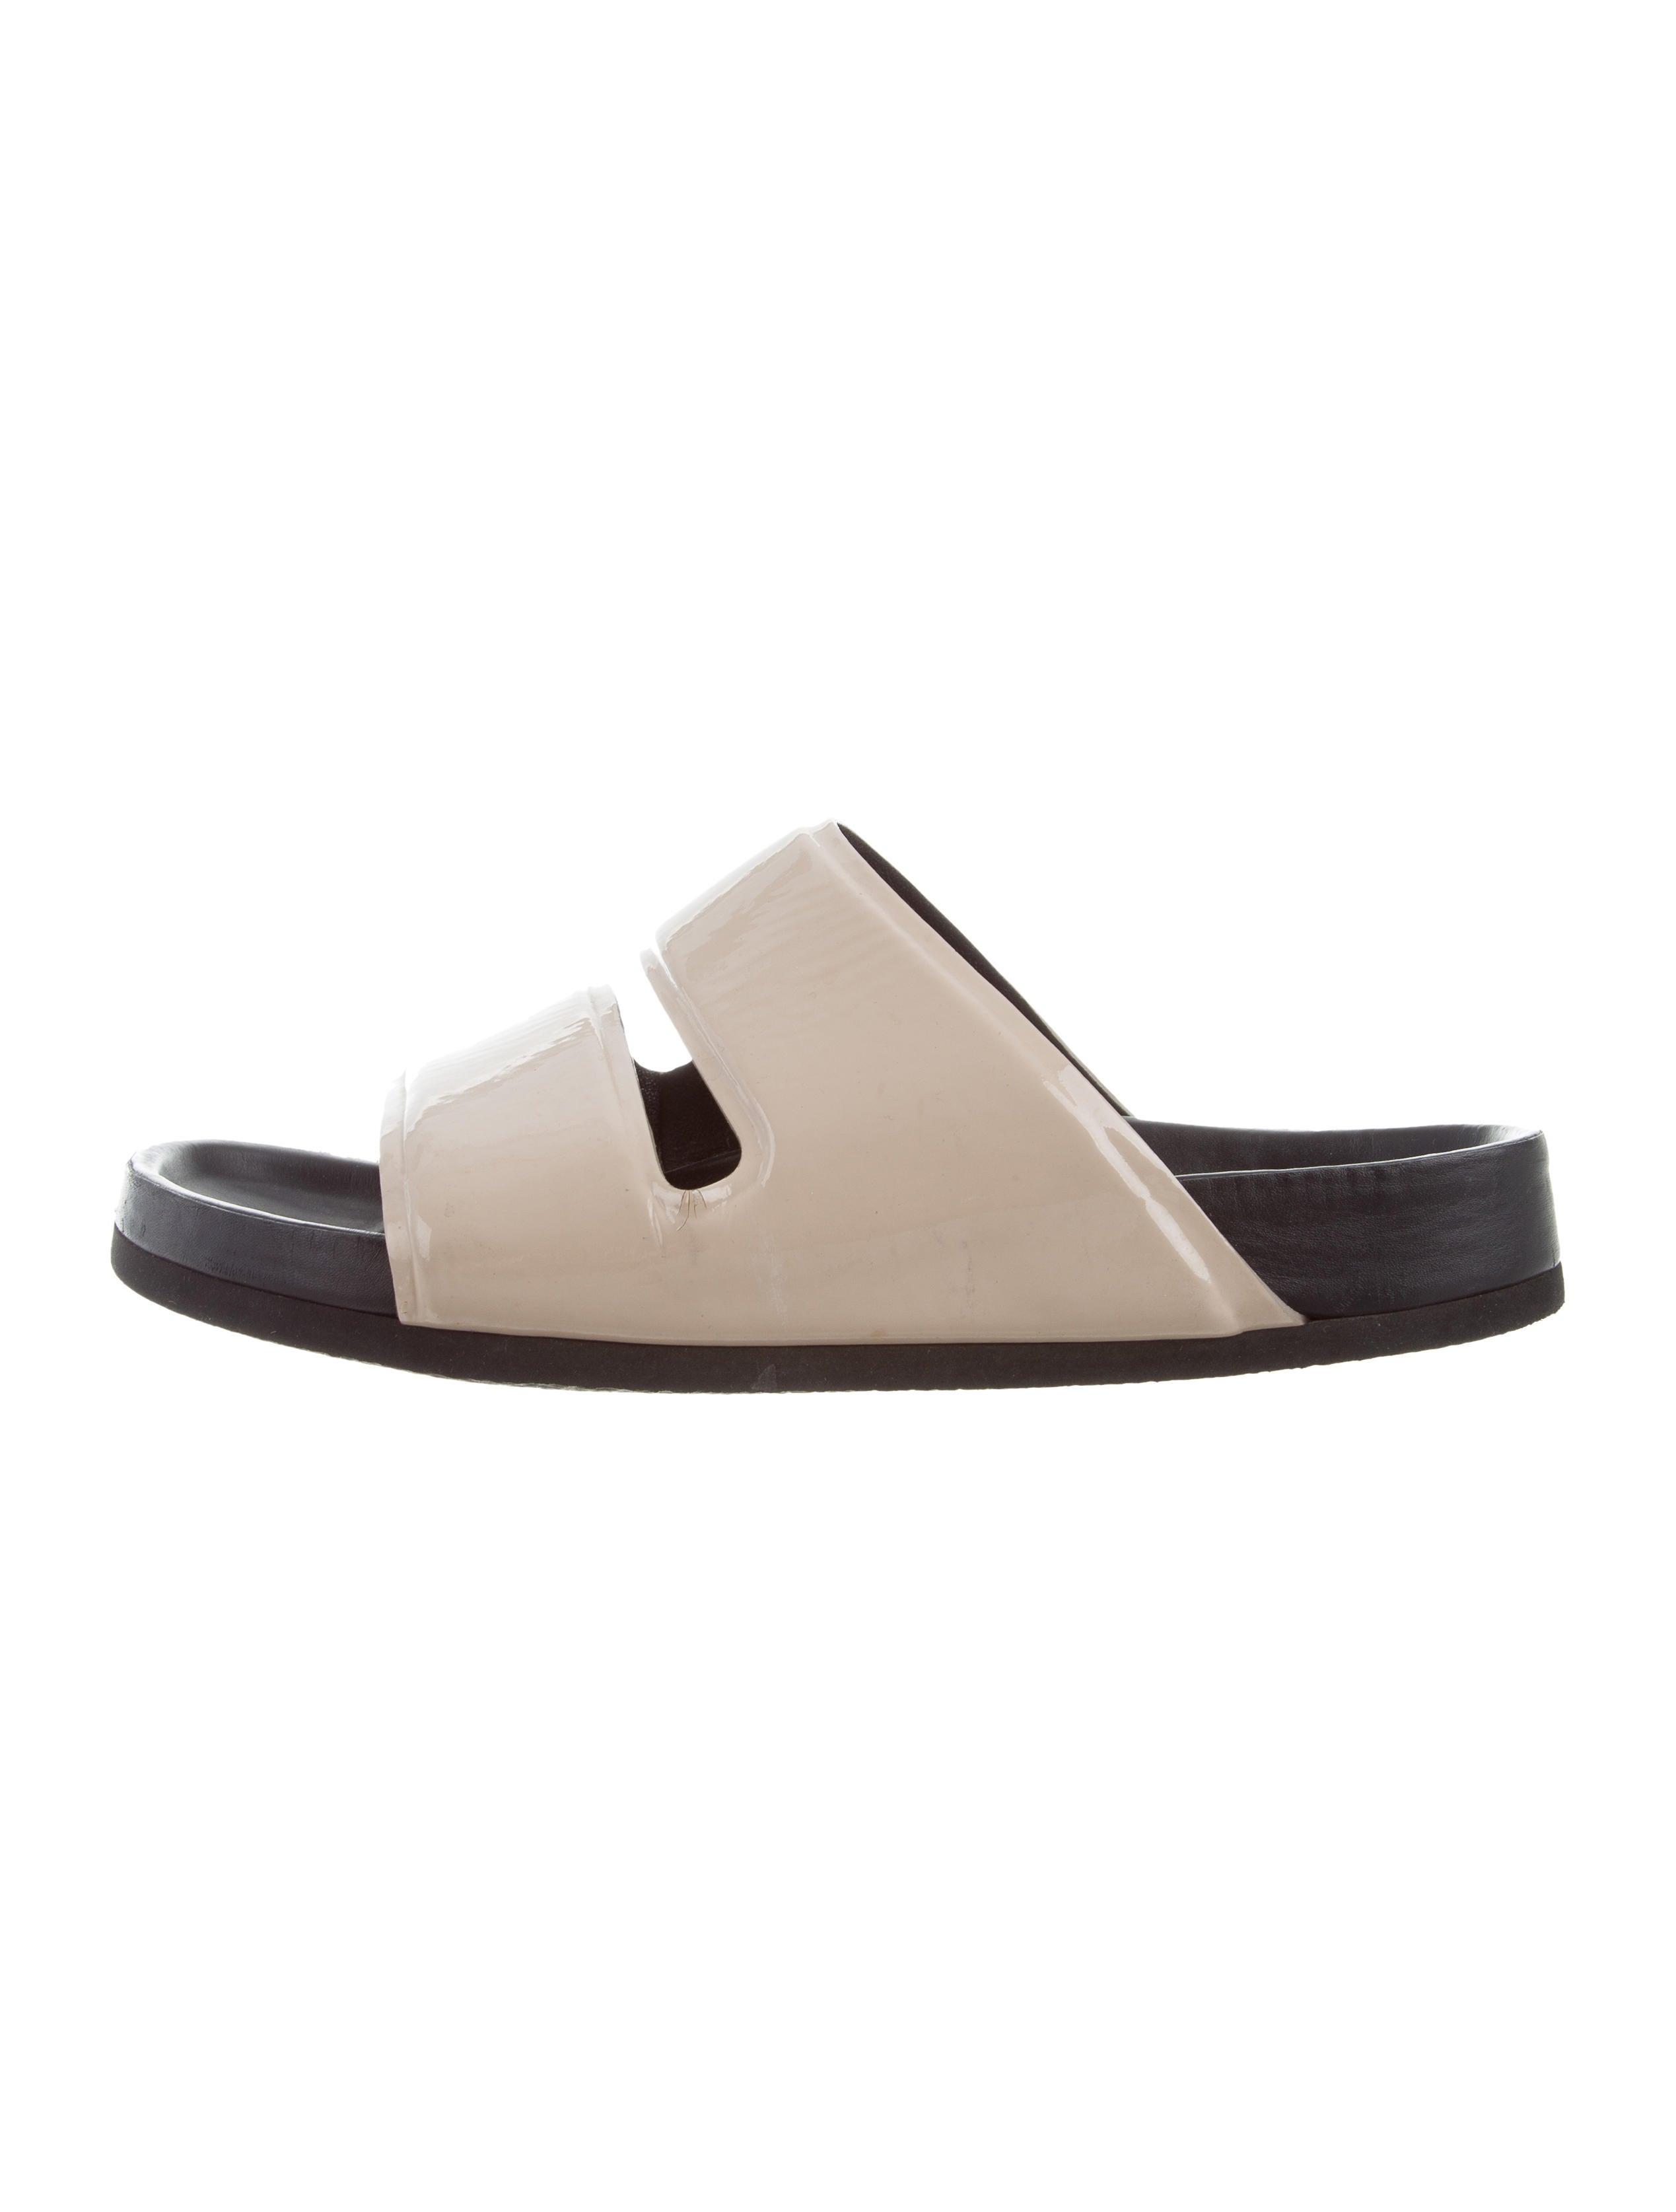 prada shoes 411 lookup phone